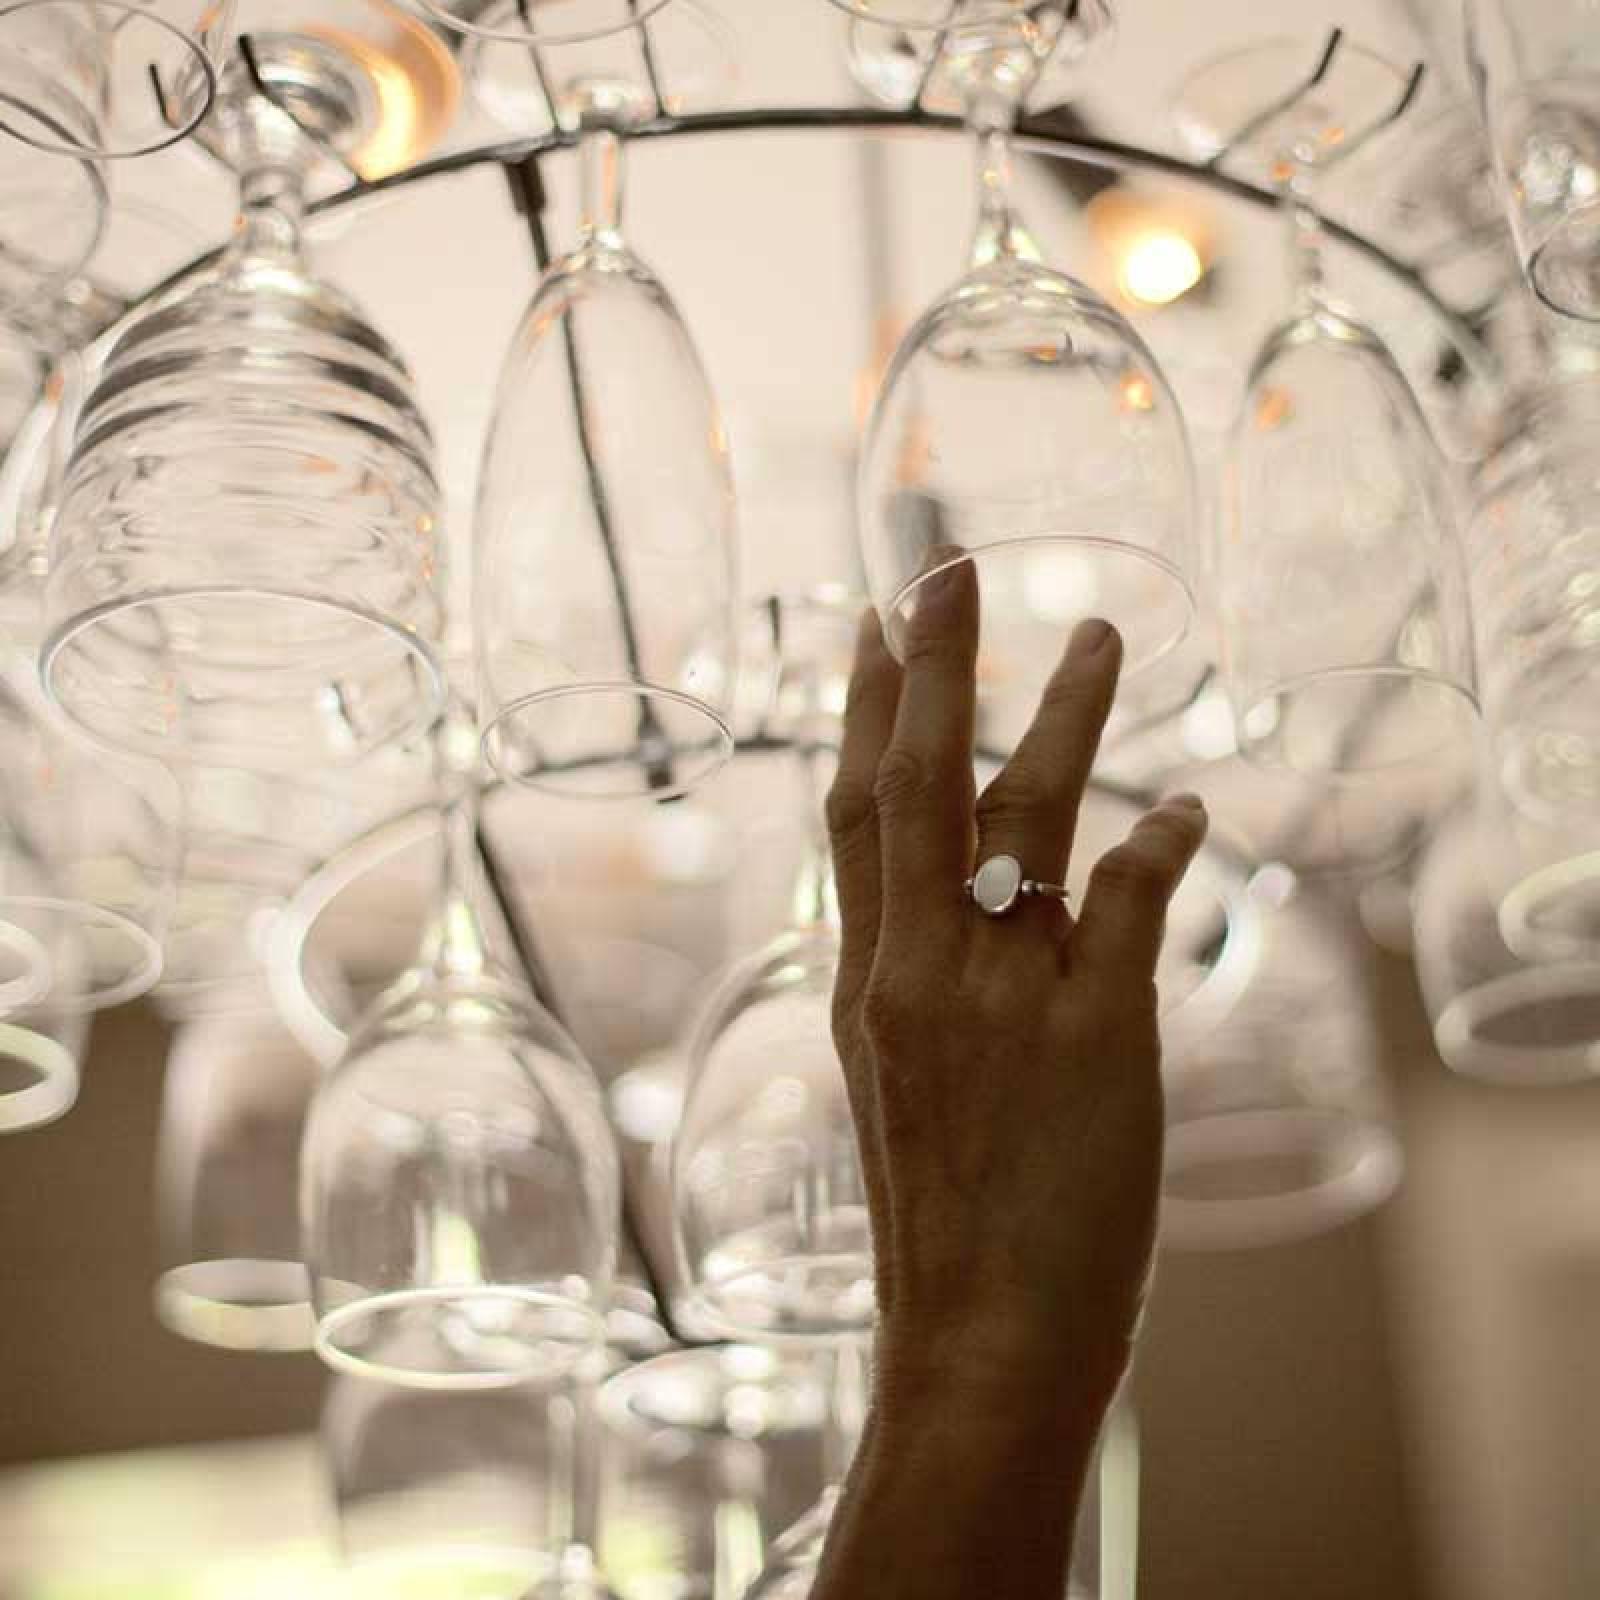 Vino Wine Glass Chandelier